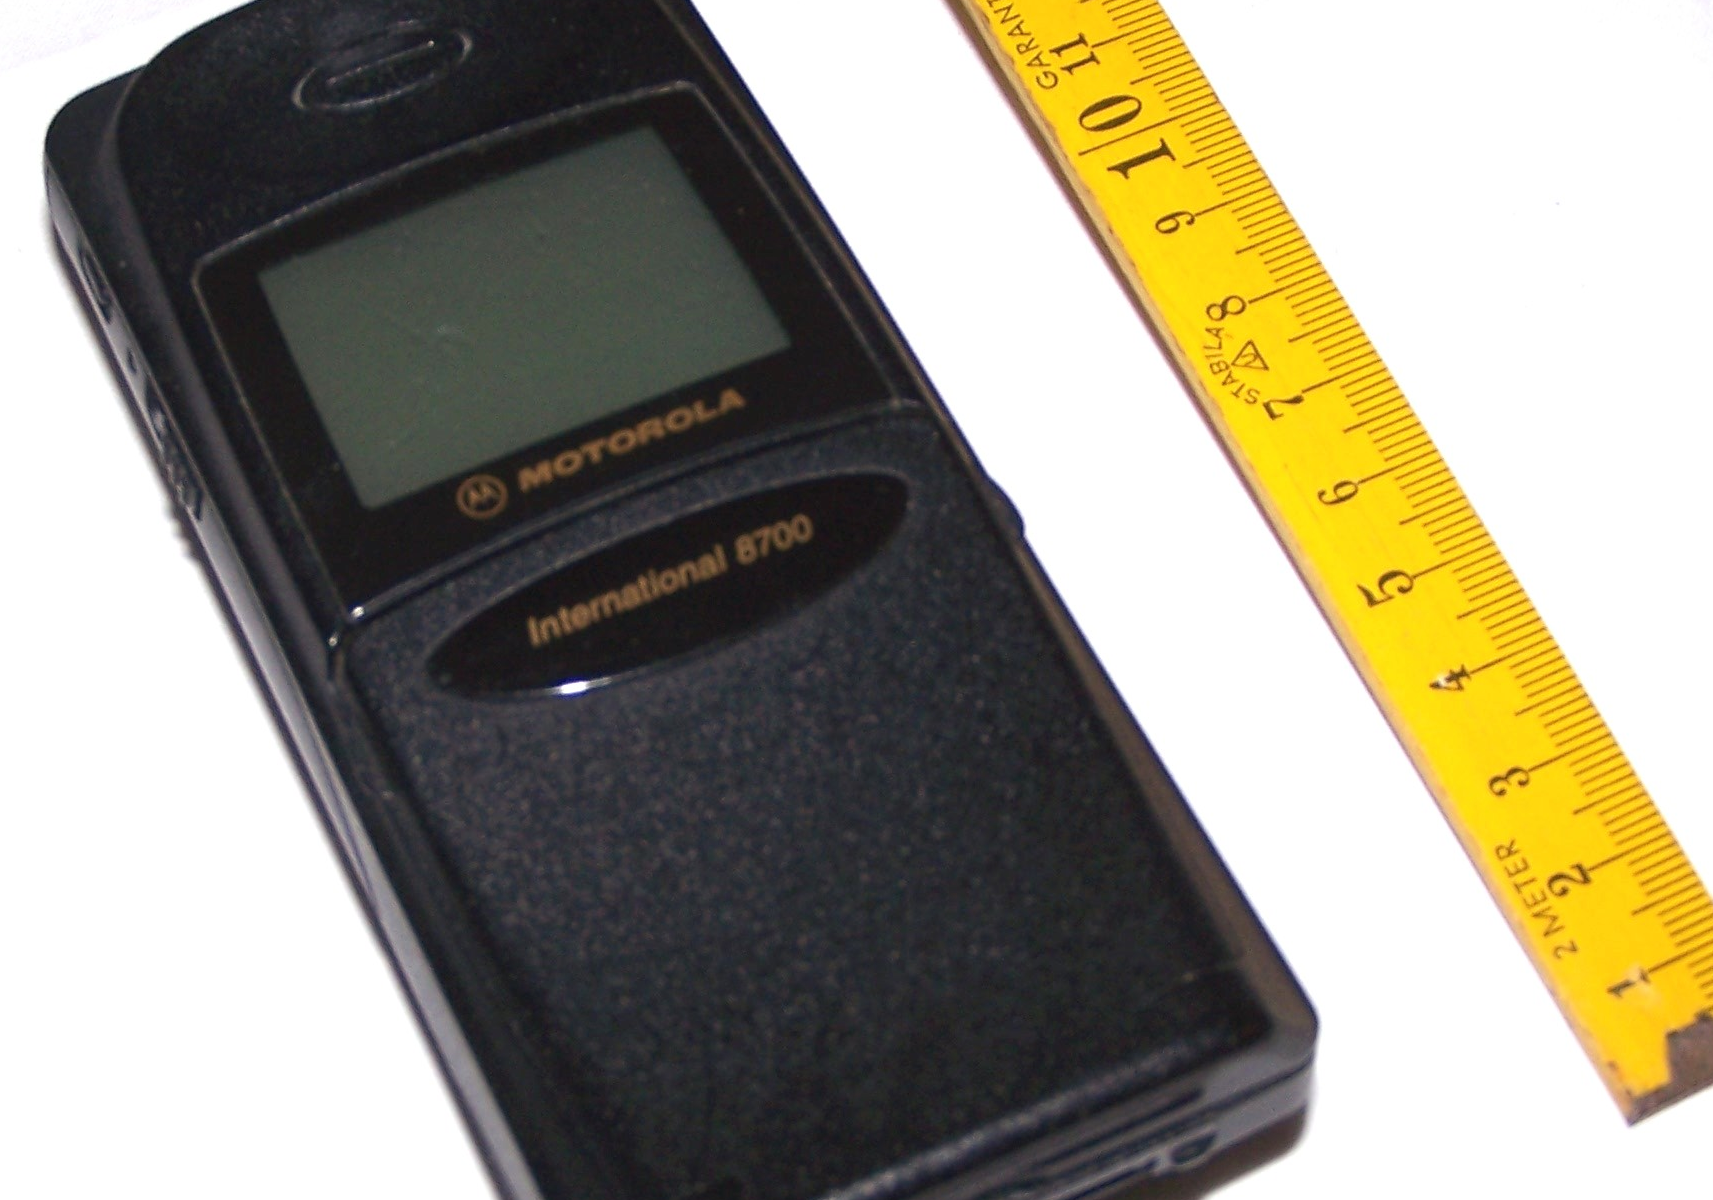 Büro - IT & Kommunikation - Mobiltelefon Motorola International 8700